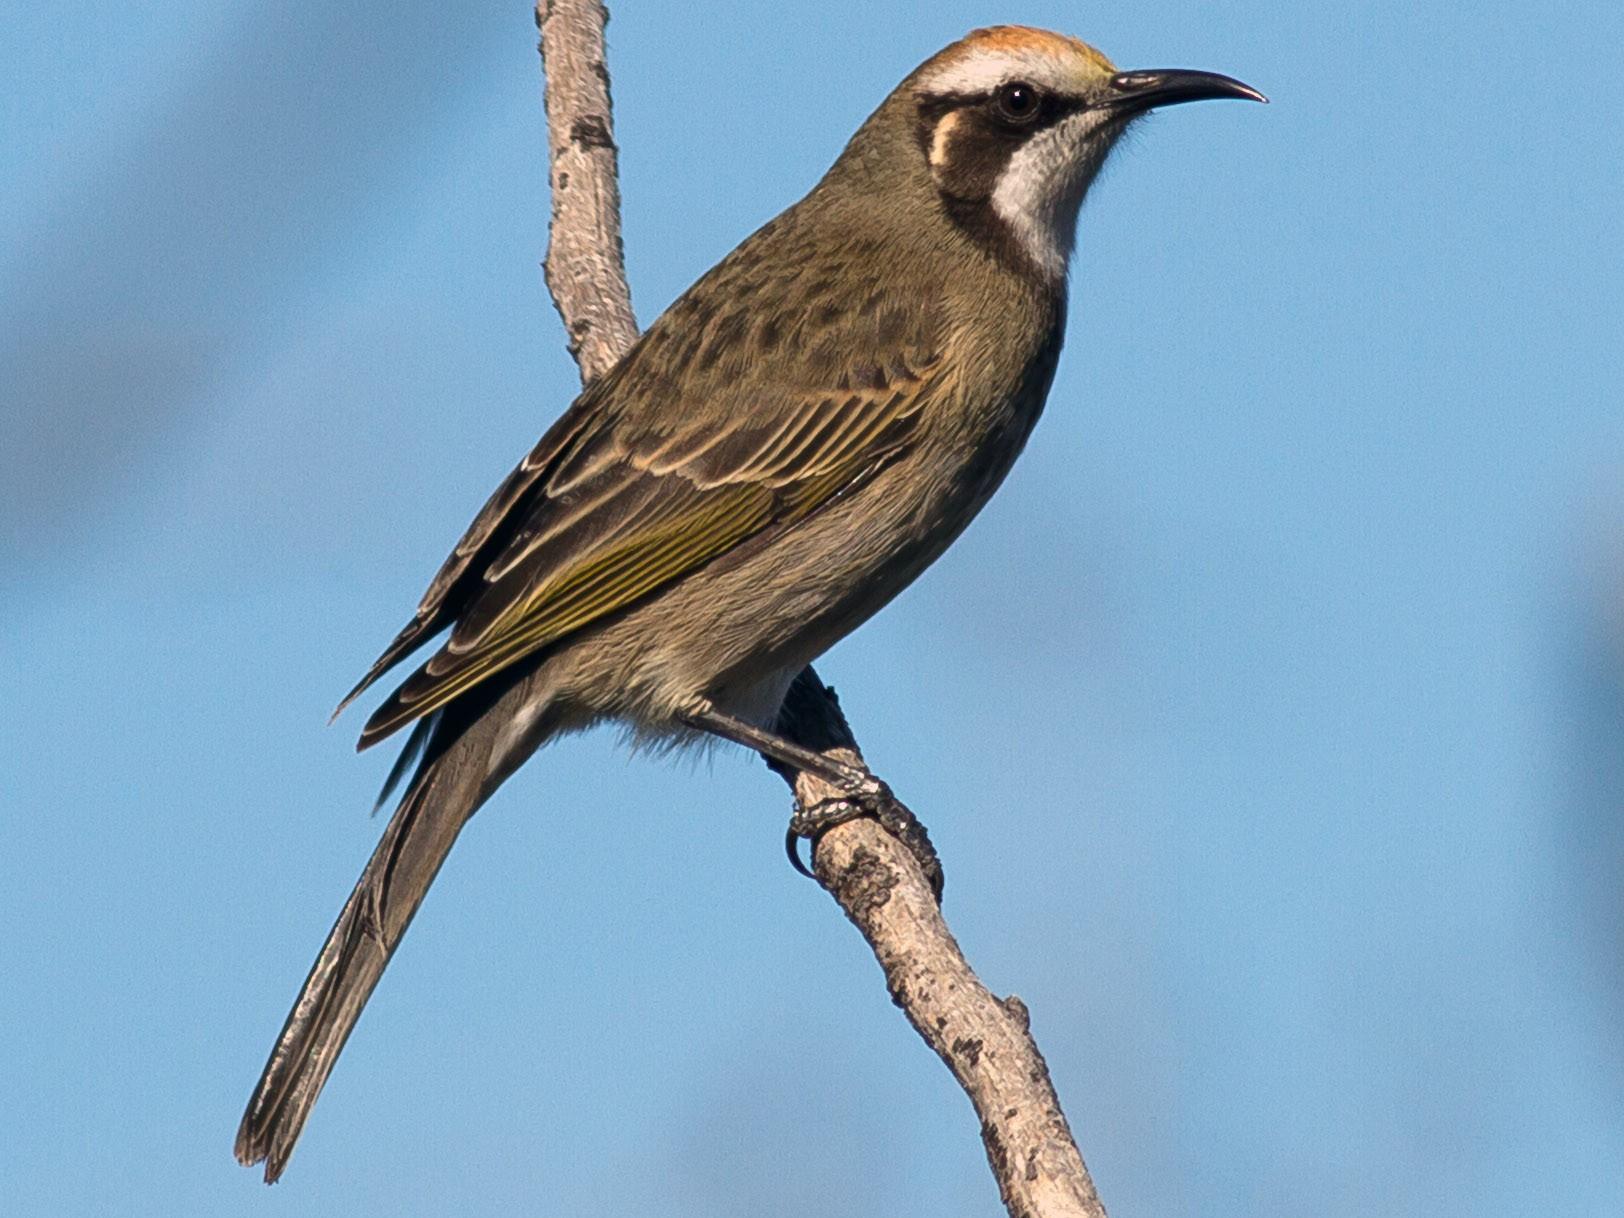 Tawny-crowned Honeyeater - Kym Nicolson